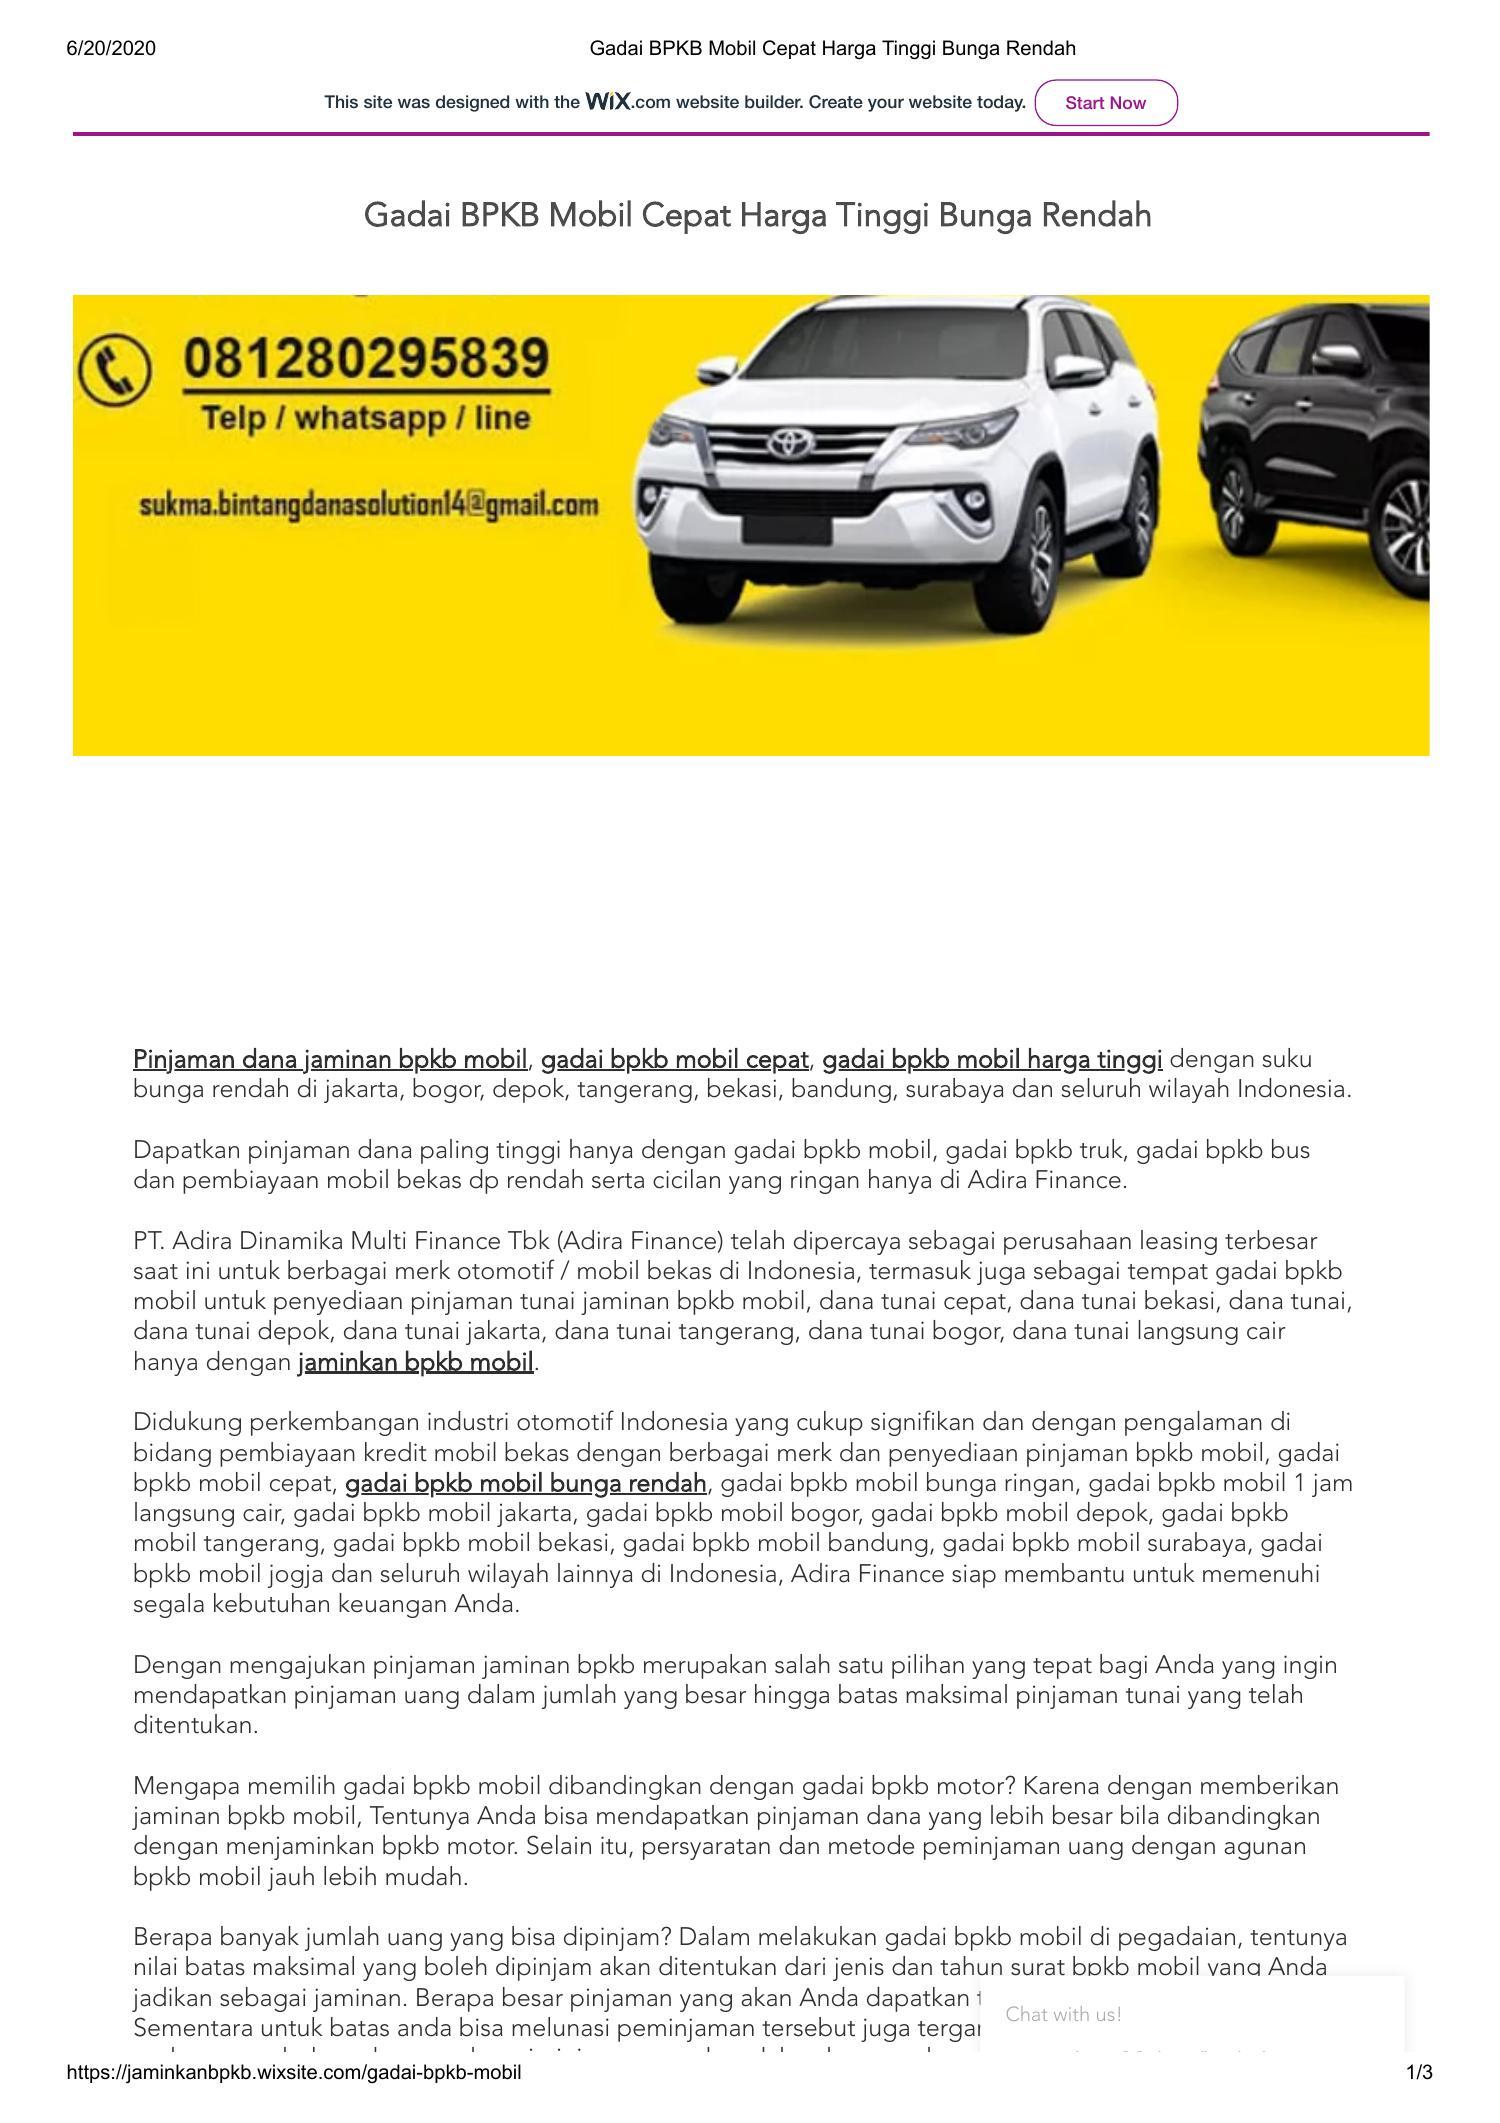 Gadai BPKB Mobil Cepat Harga Tinggi Bunga Rendah.pdf ...